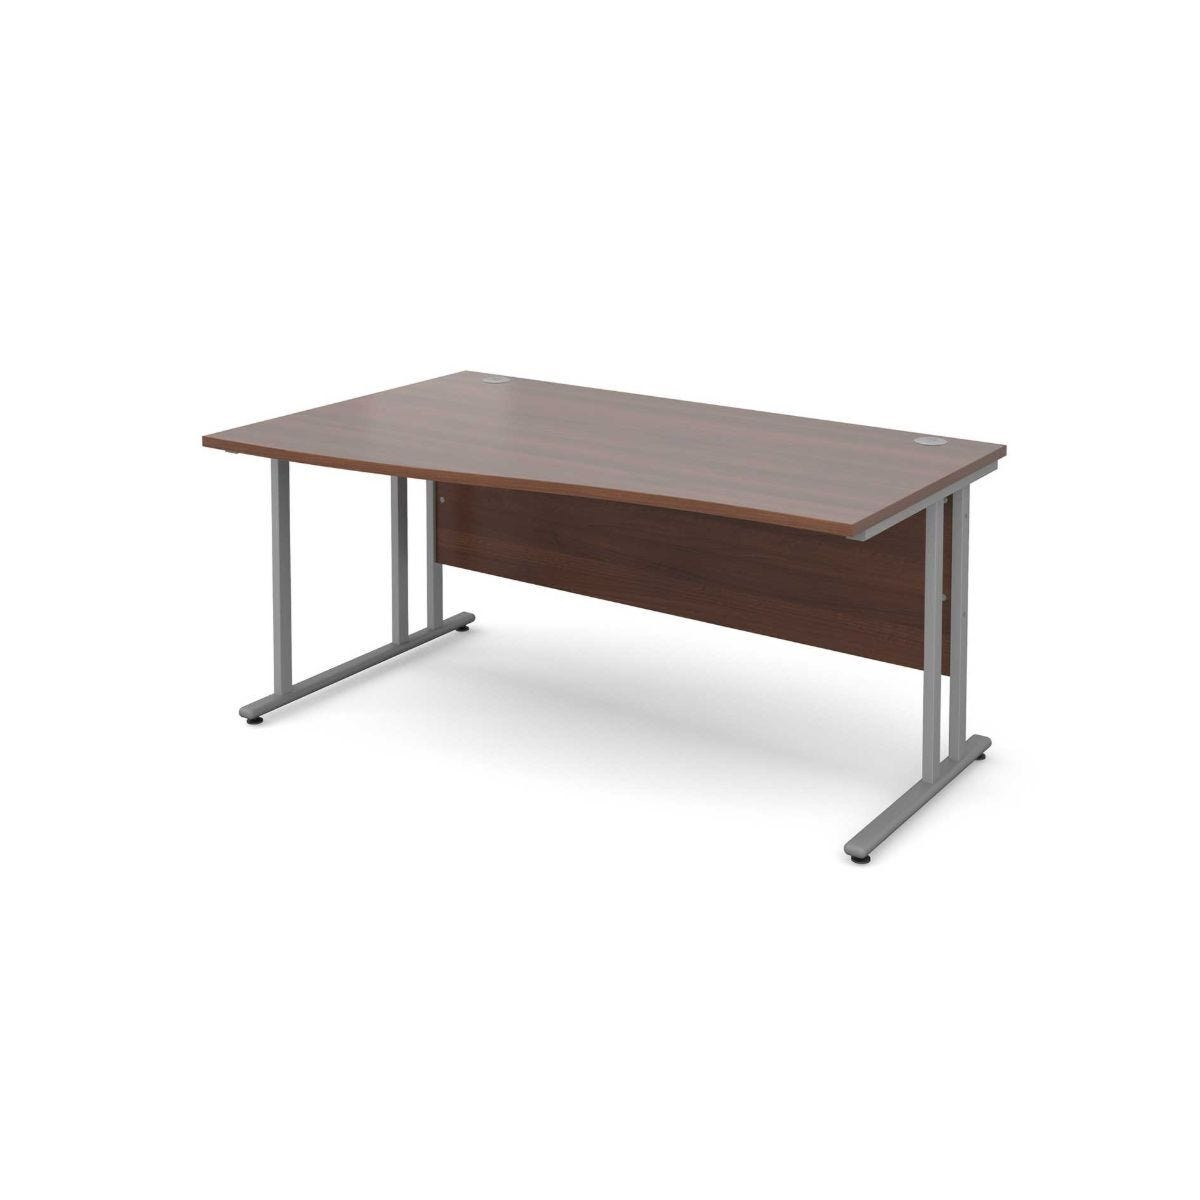 Maestro 25 Left Hand Wave 1600 Desk with Silver Legs silver leg walnut